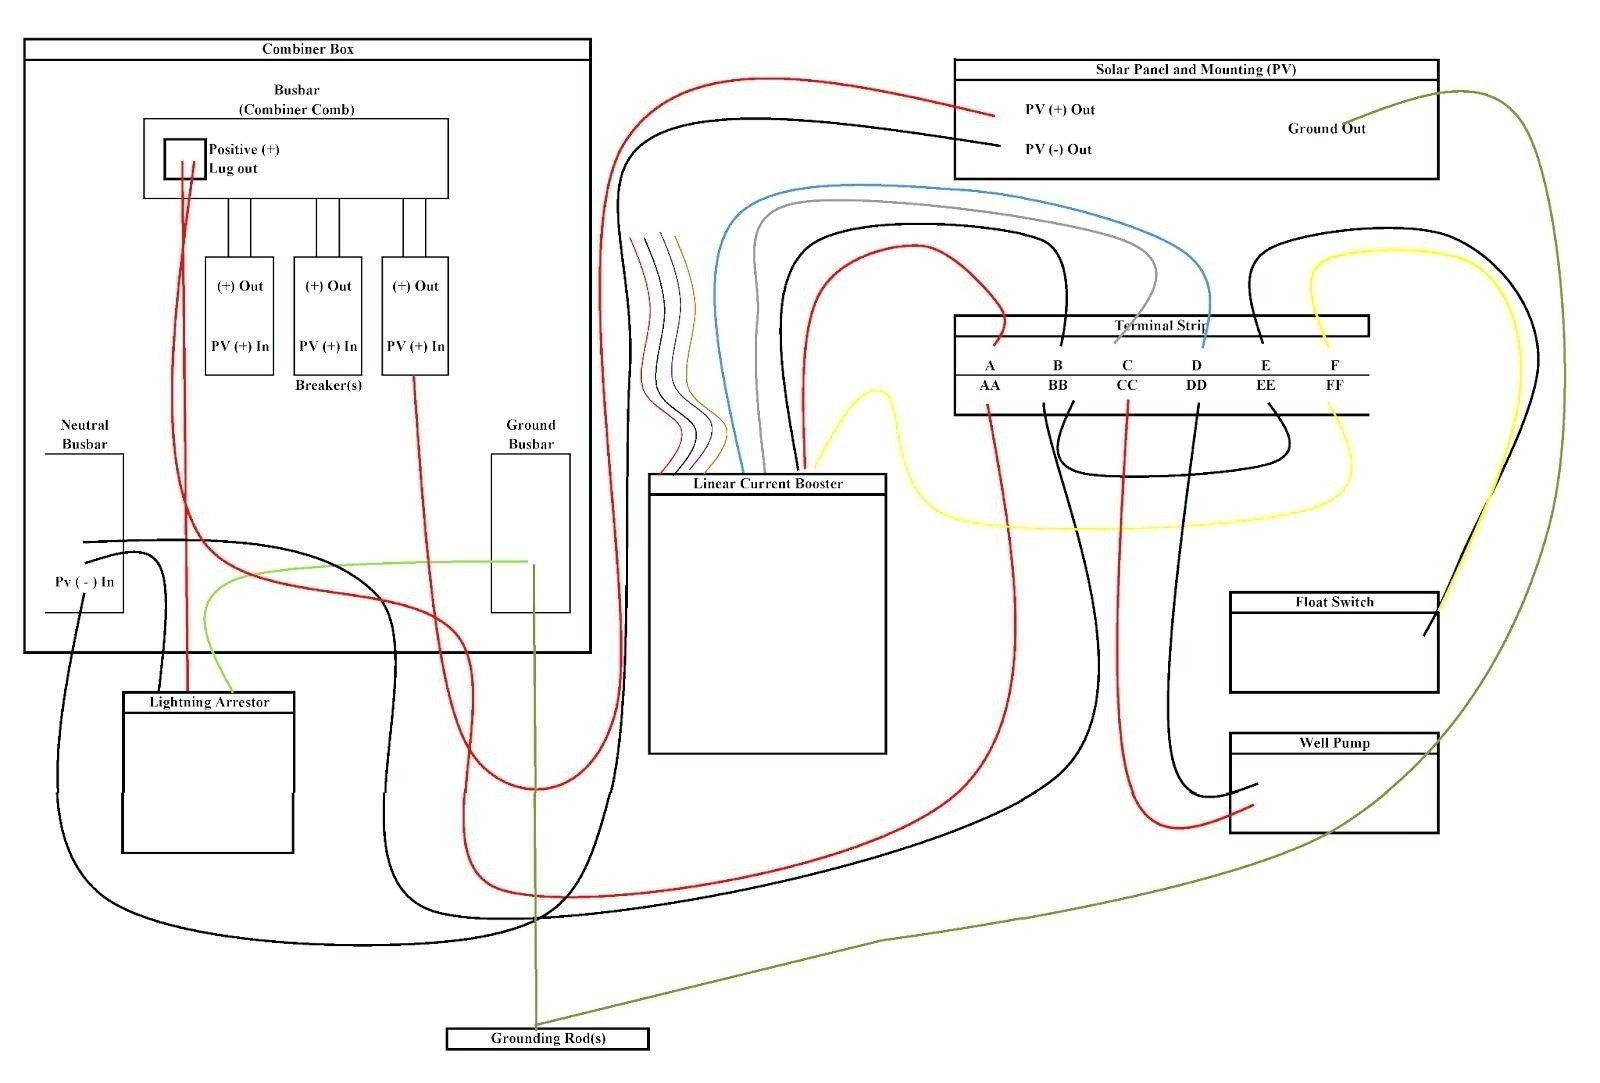 well pump pressure switch wiring diagram awesome wiring diagram for 220v switch wiring diagram [ 1600 x 1083 Pixel ]